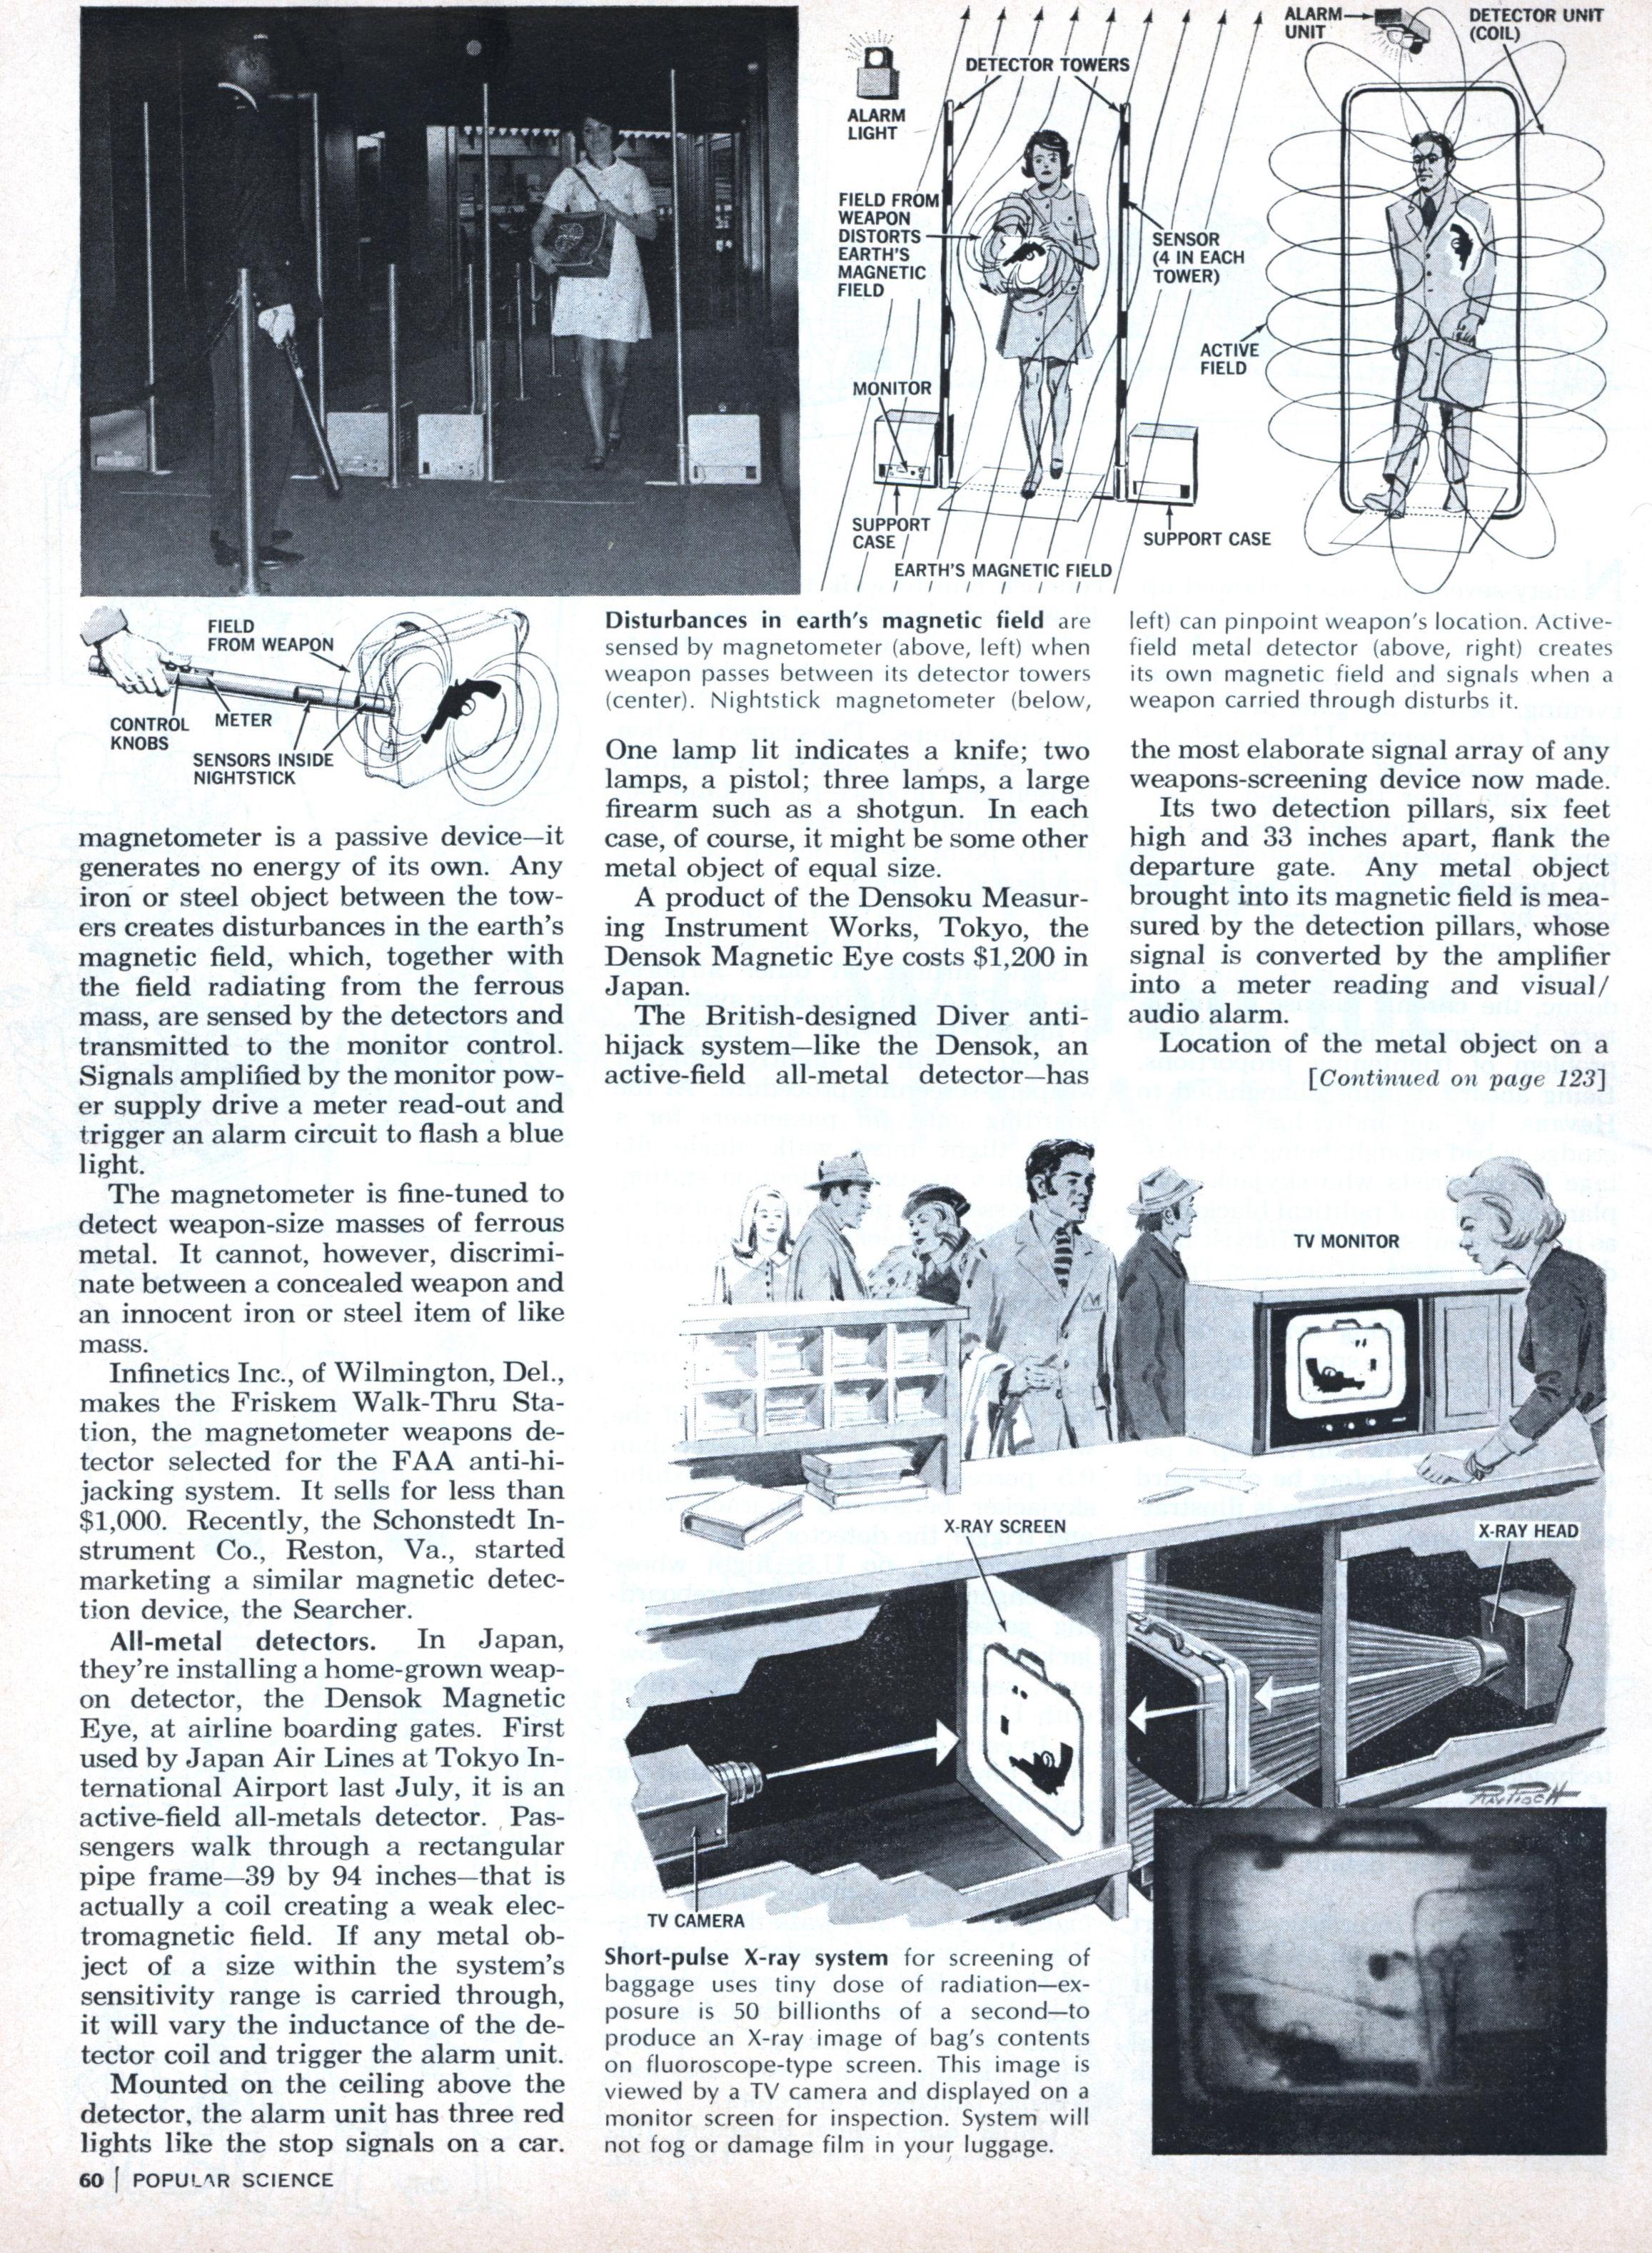 http://blog.modernmechanix.com/mags/PopularScience/11-1970/skyjackers/skyjackers_2.jpg